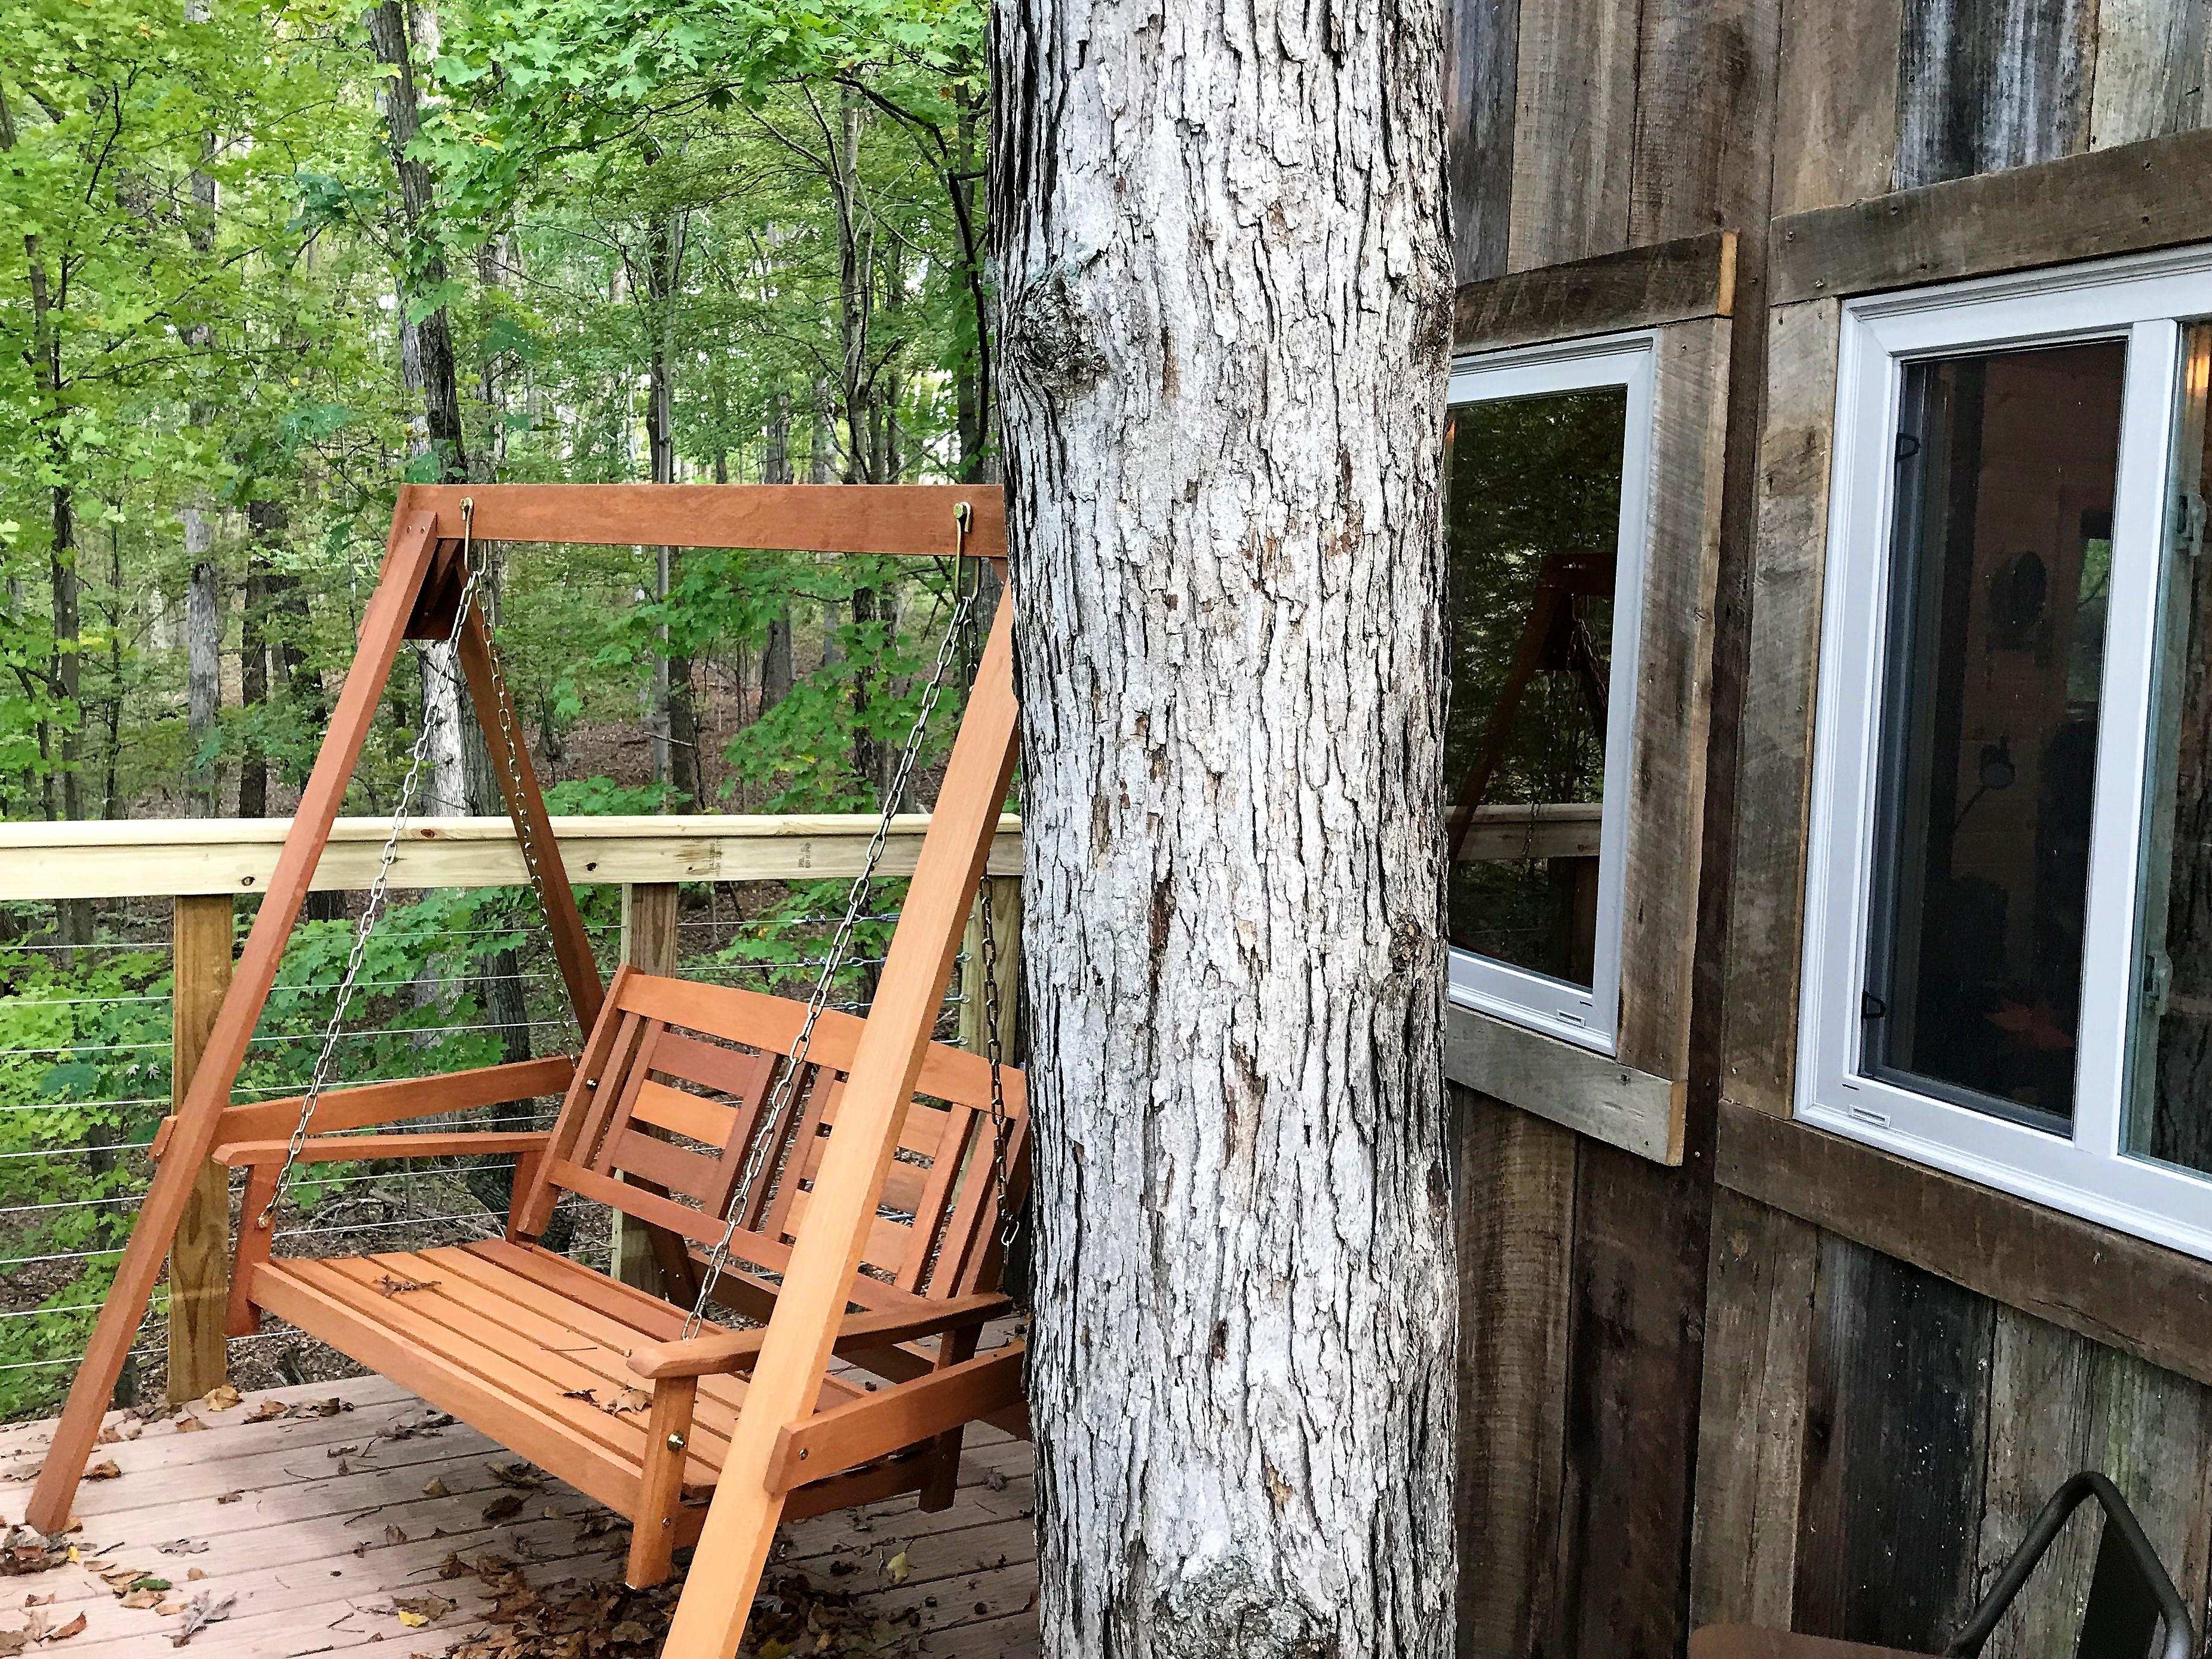 swing - enjoy the swing on the back deck